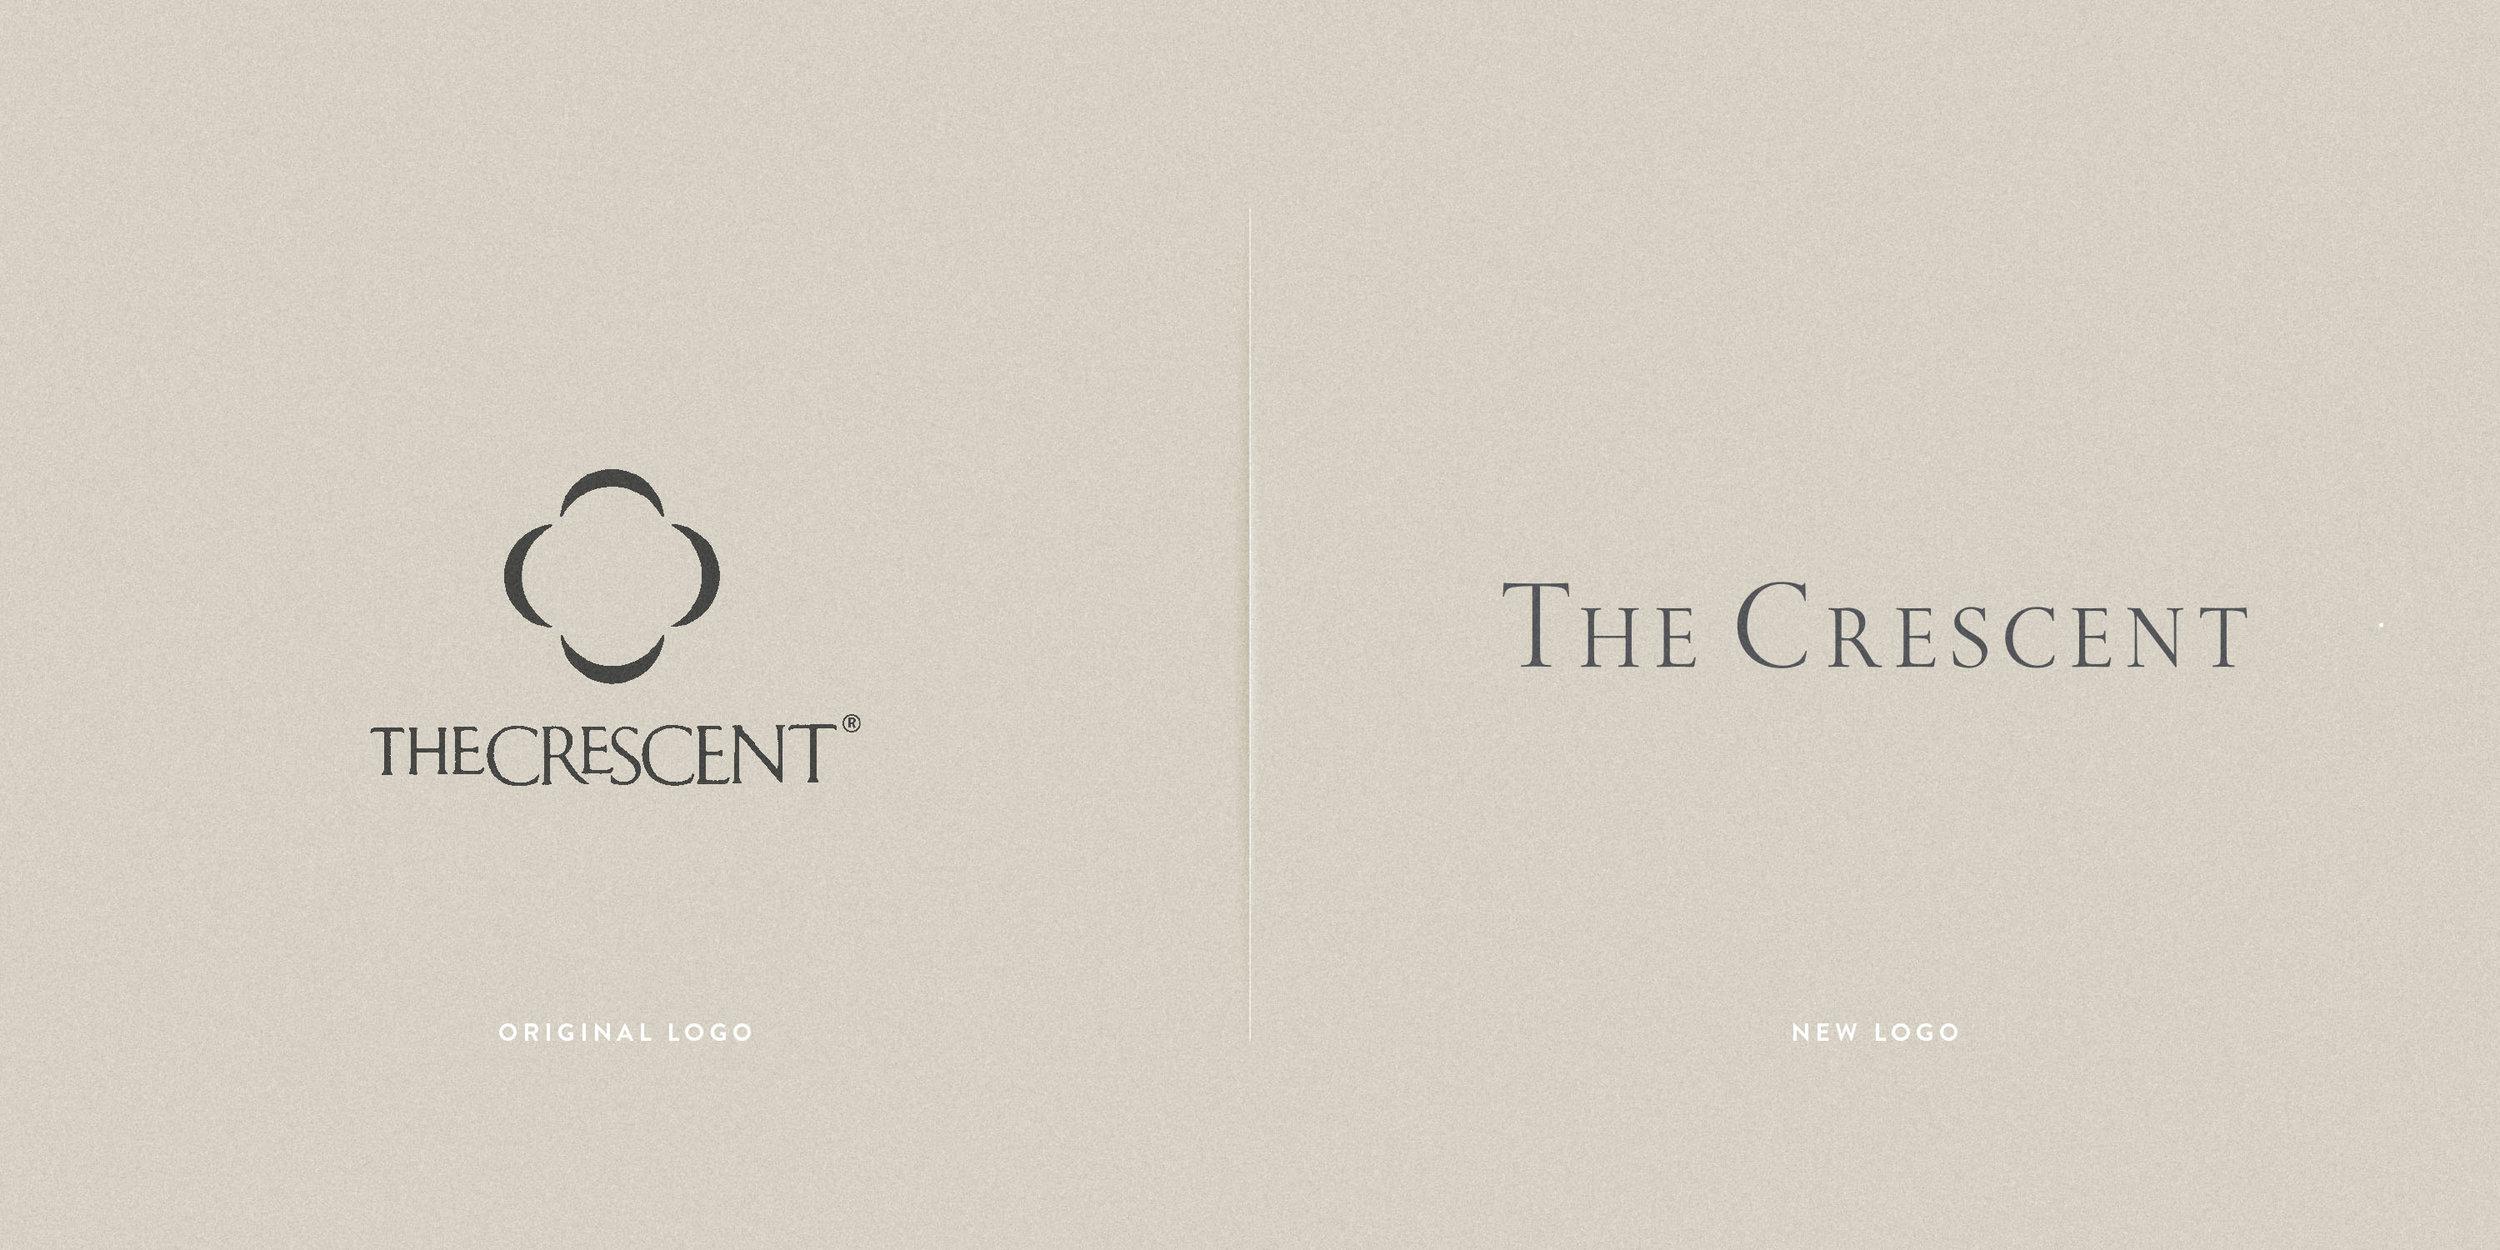 ronaldvillegas-the-crescent-dallas-identity-logo.jpg